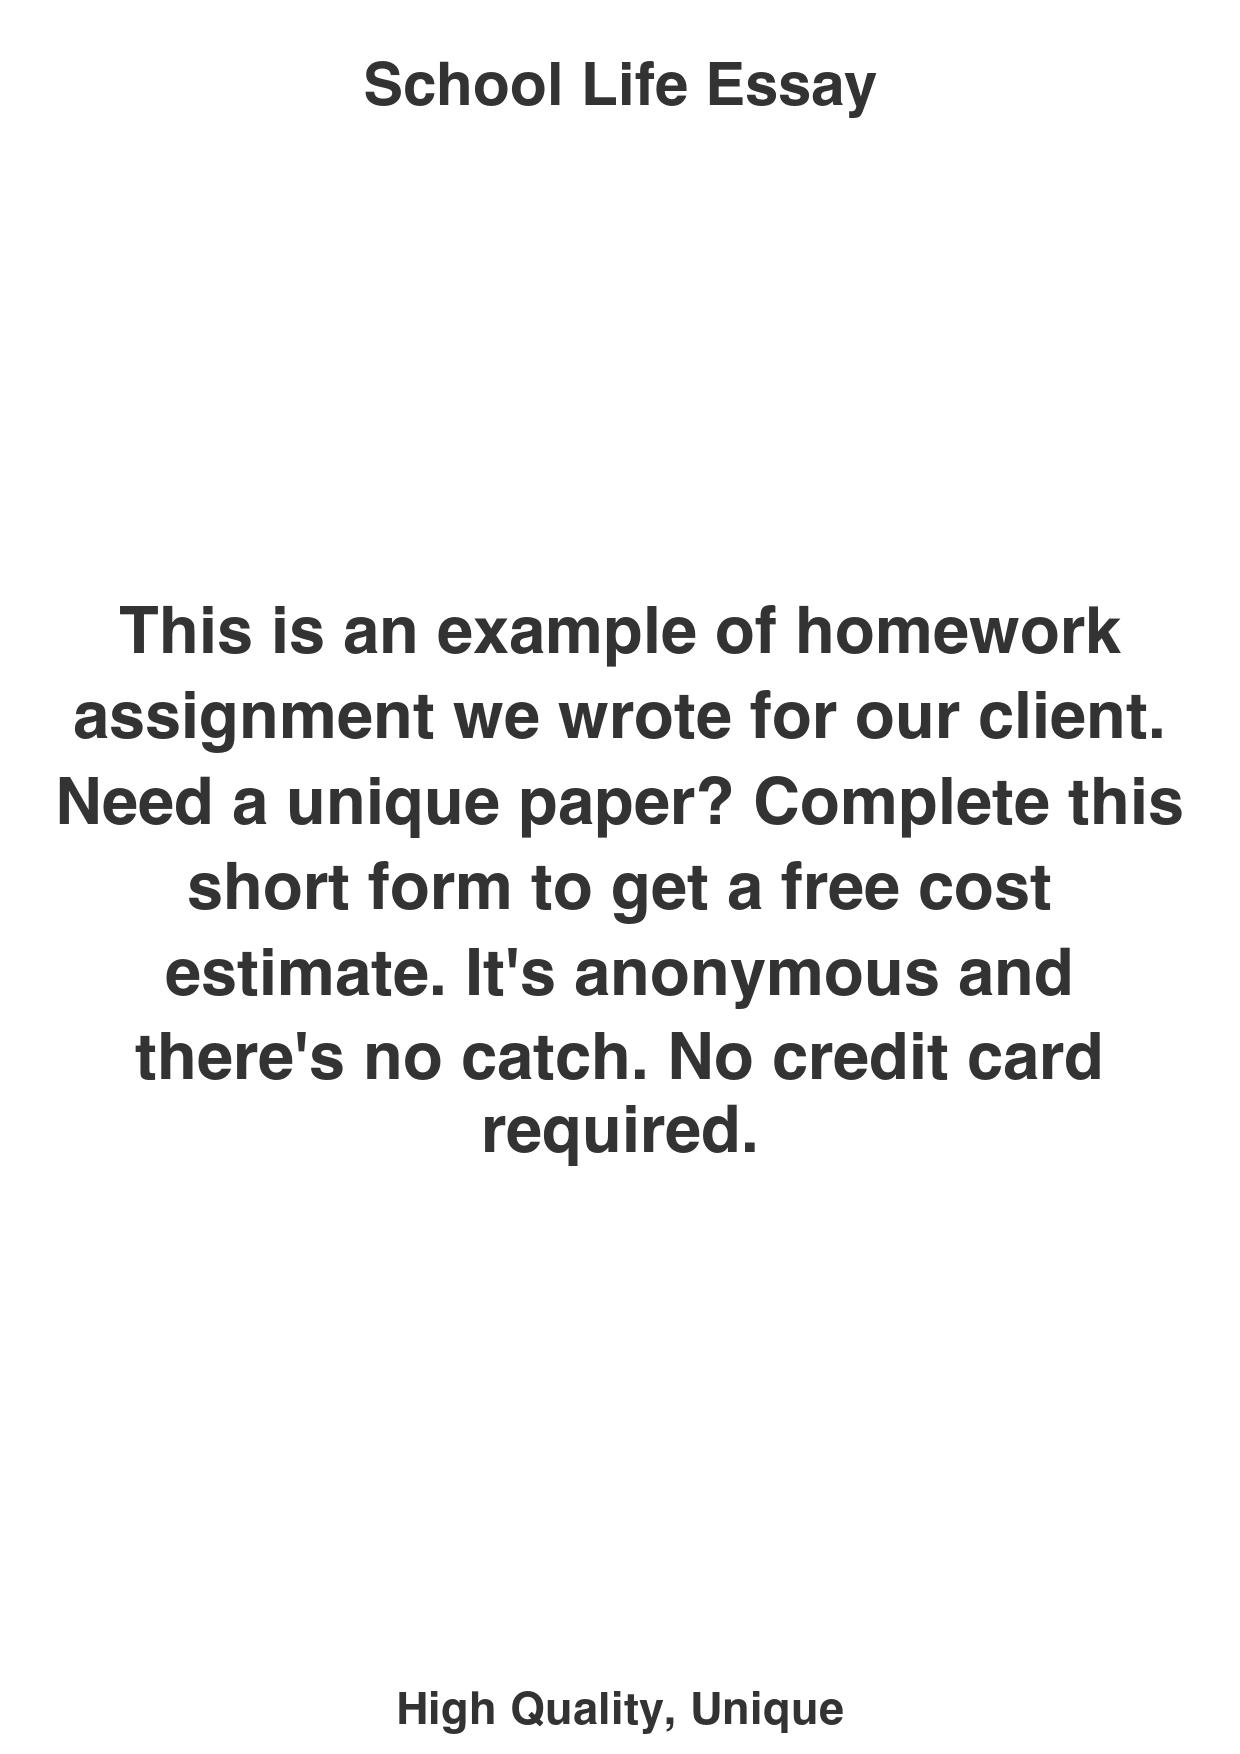 School Life Essay - College Paper Writing Service Catalog